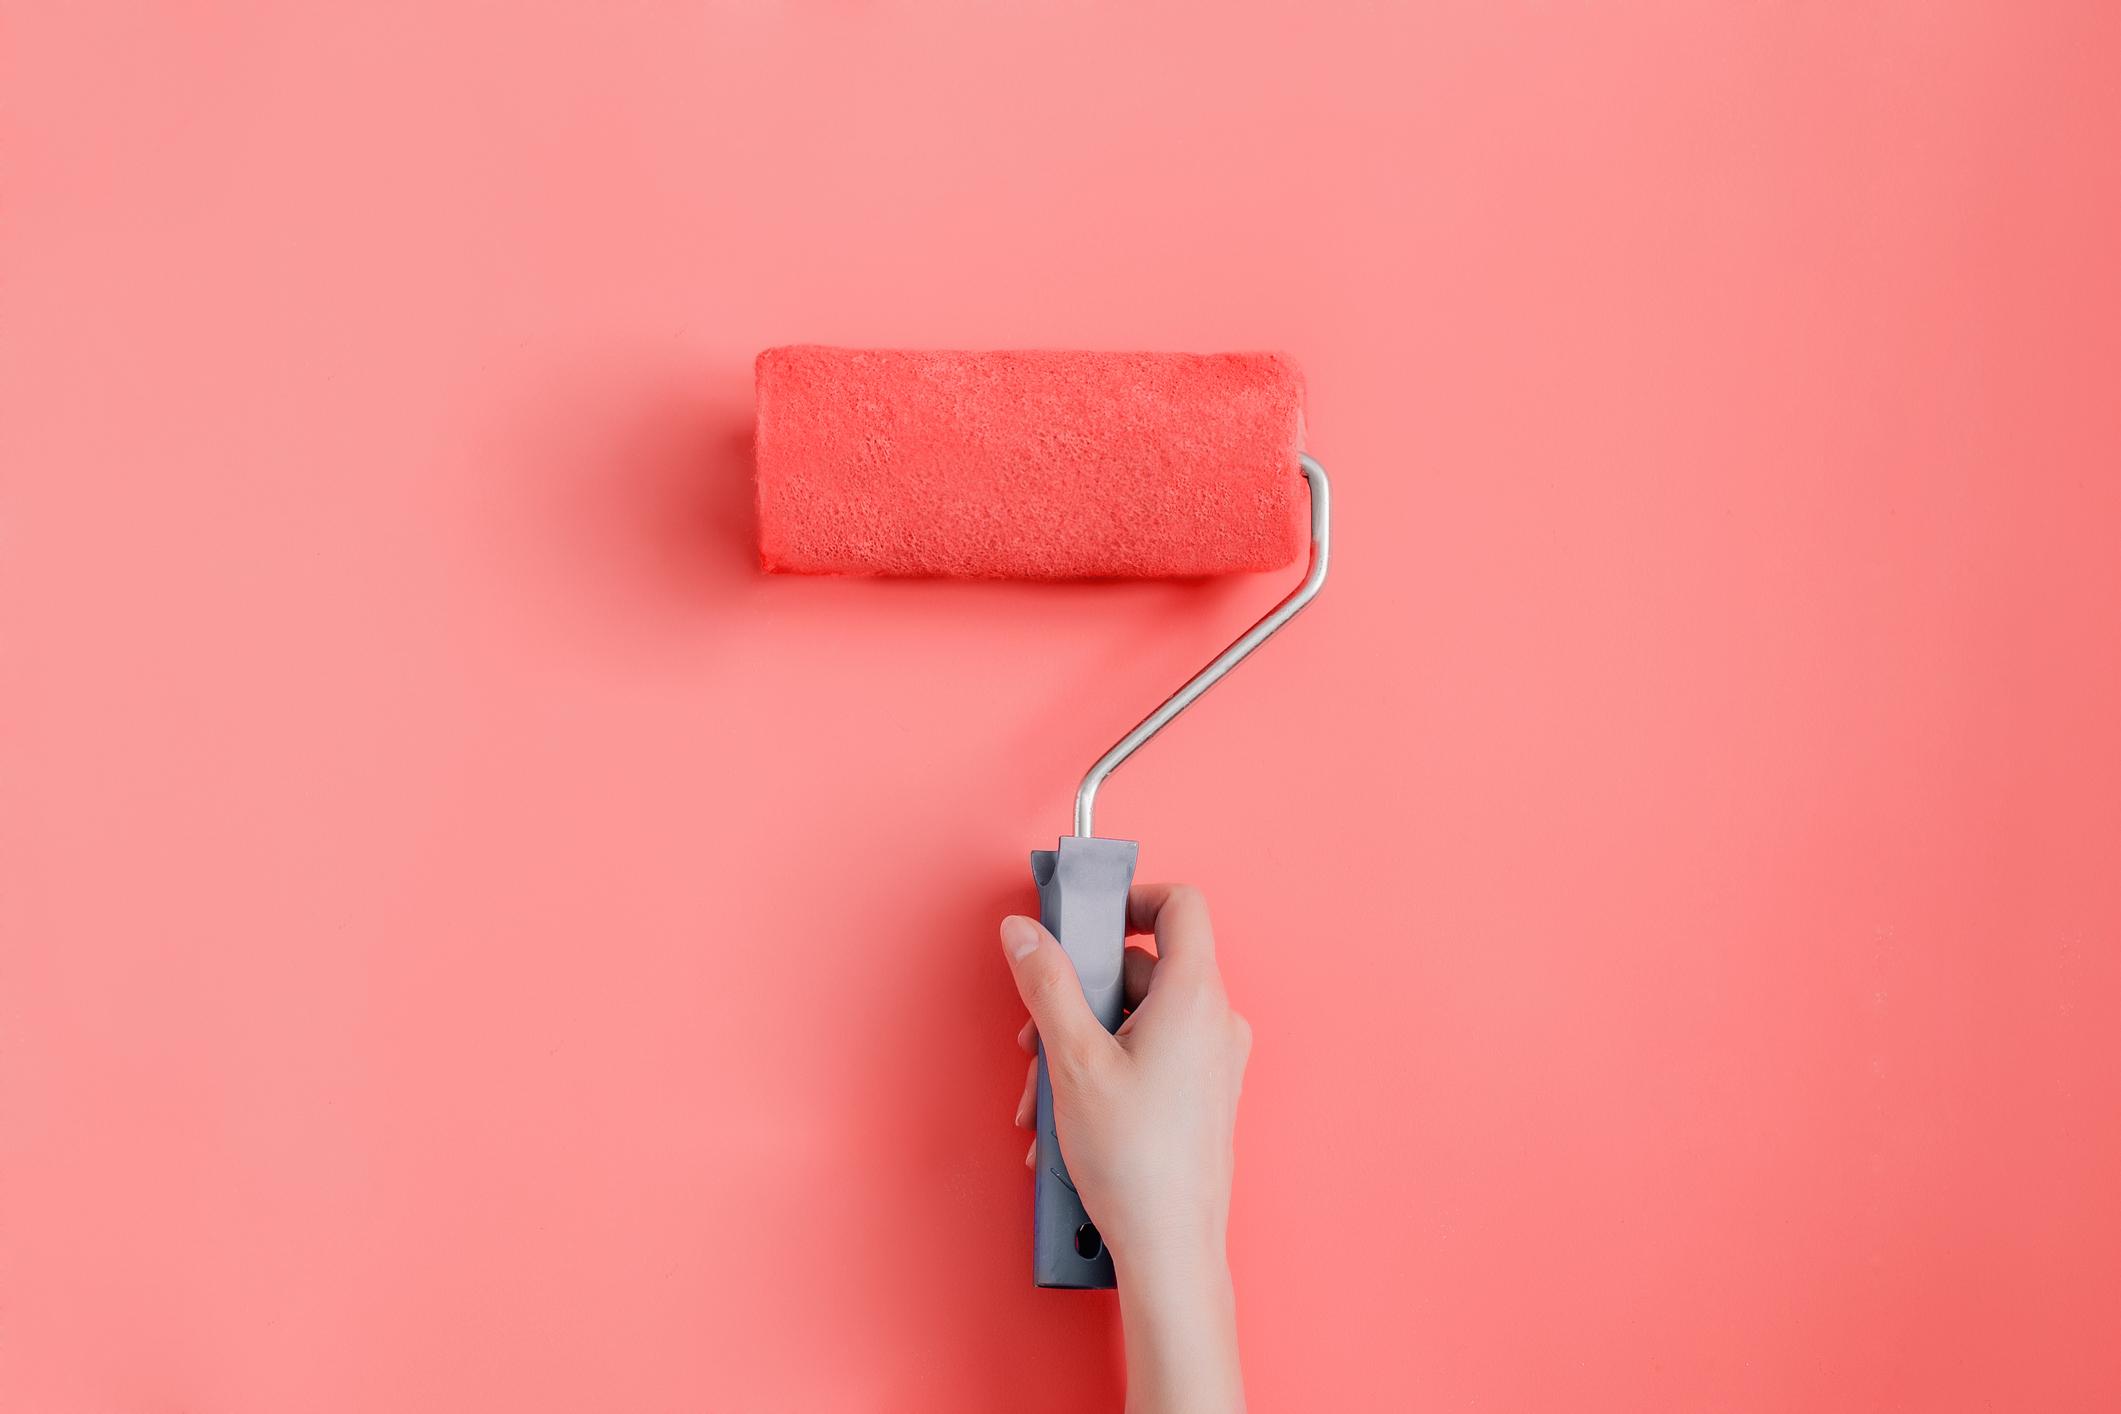 consejos pintar paredes